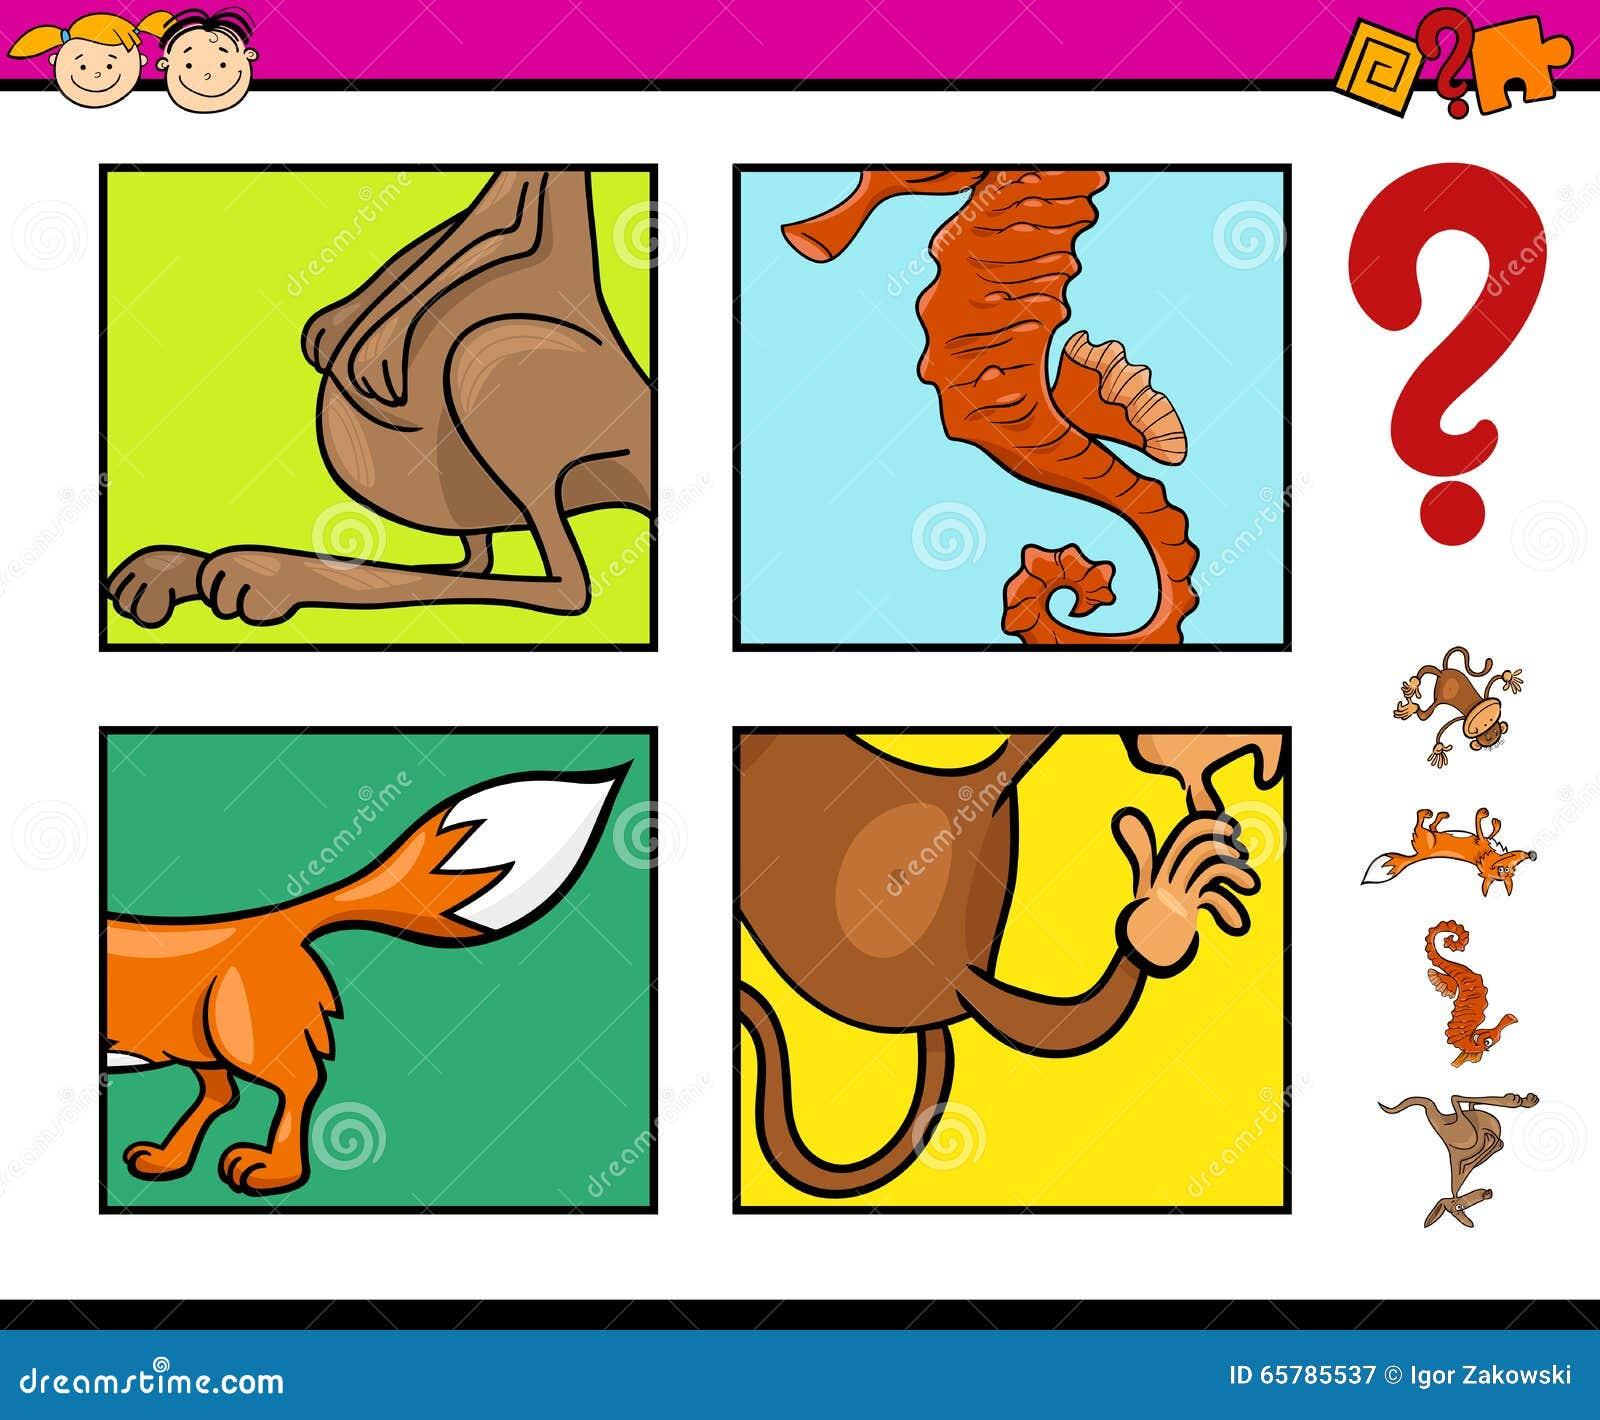 Dream Animals Diagram Manual Guide Wiring Honda Parts Preschool Task With Stock Vector Illustration Of Rh Dreamstime Com Tumblr Running